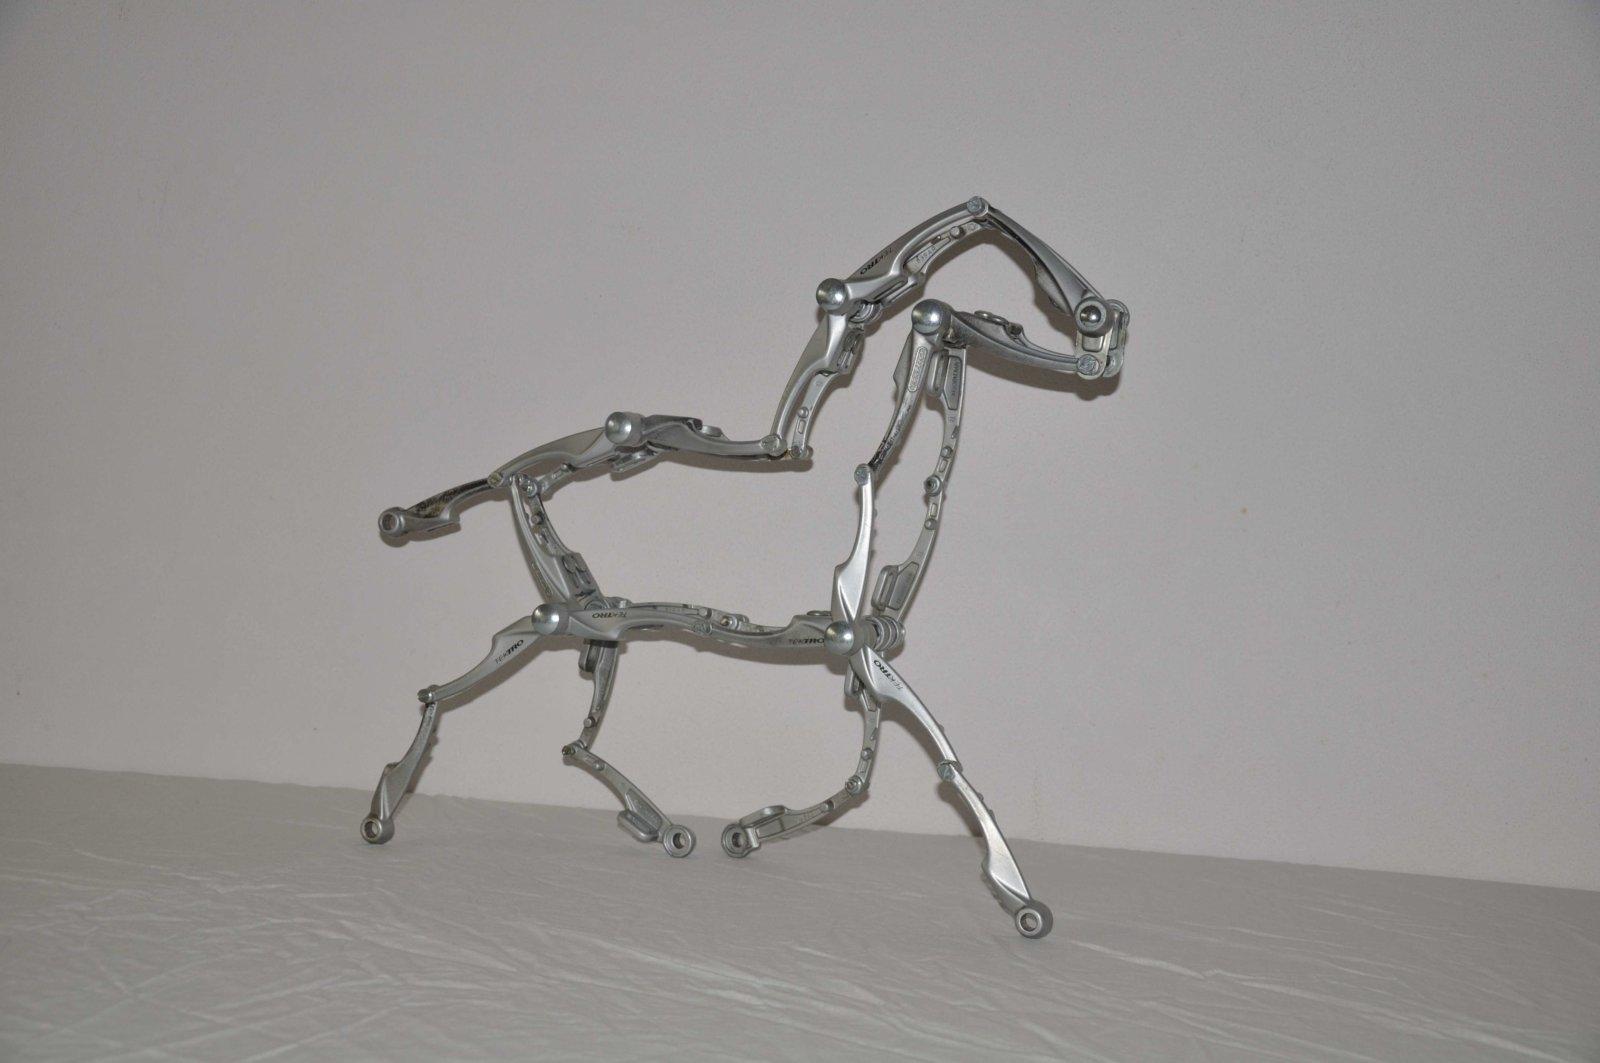 Galloperend Paard Horse Pferd Cheval Cavallo Caballo Da Vinci Decreatievelink Fietskunst